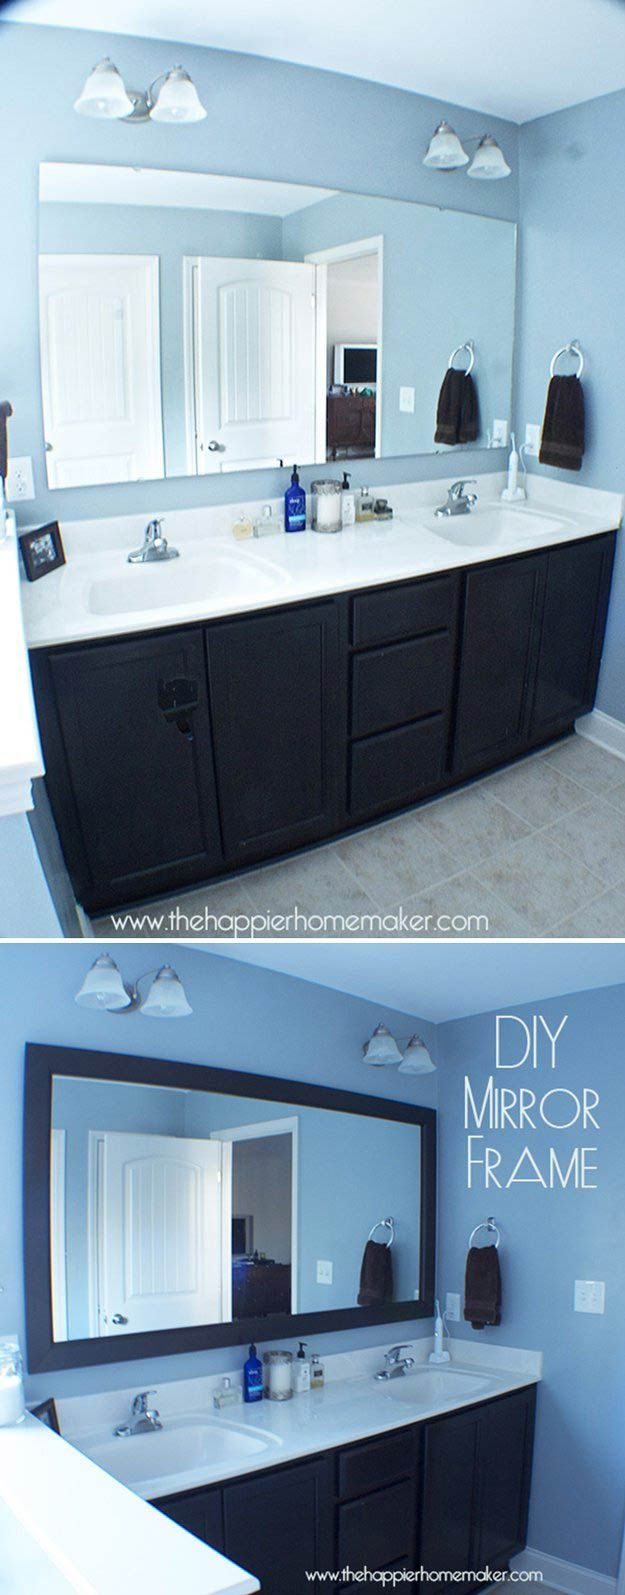 Decorating On A Budget Mirror Bathroom Decorating Ideas and Diy